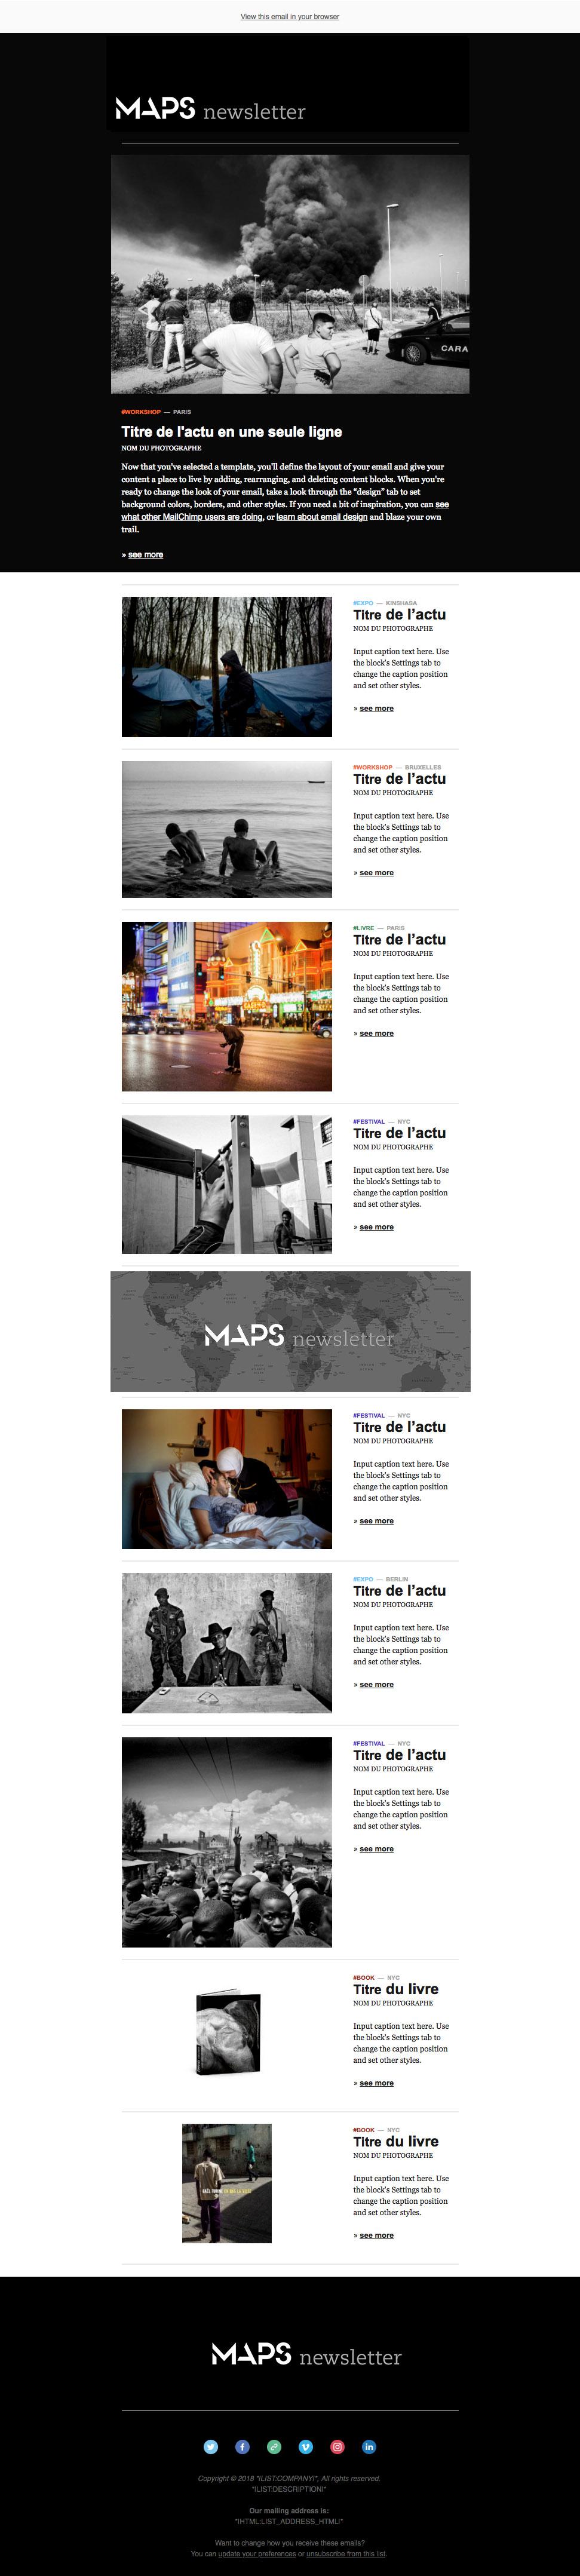 MAPS_newsletter_SPAM_01c